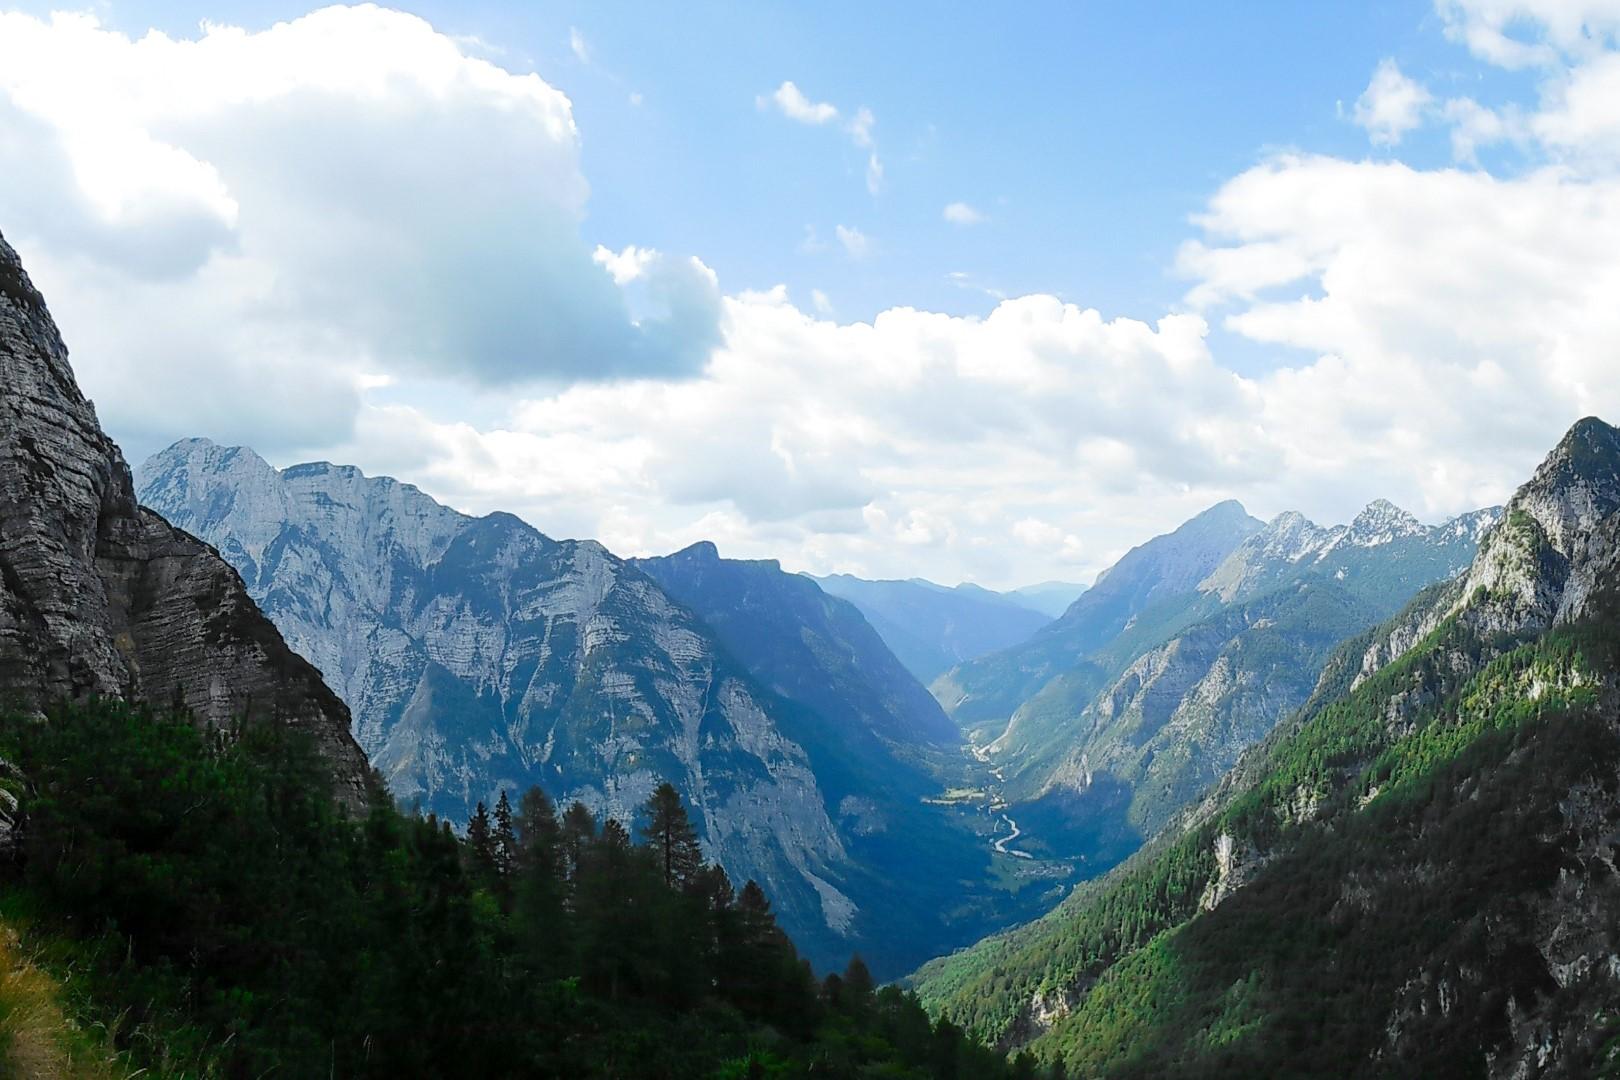 Widok na Alpy Julijskie i dolinę.